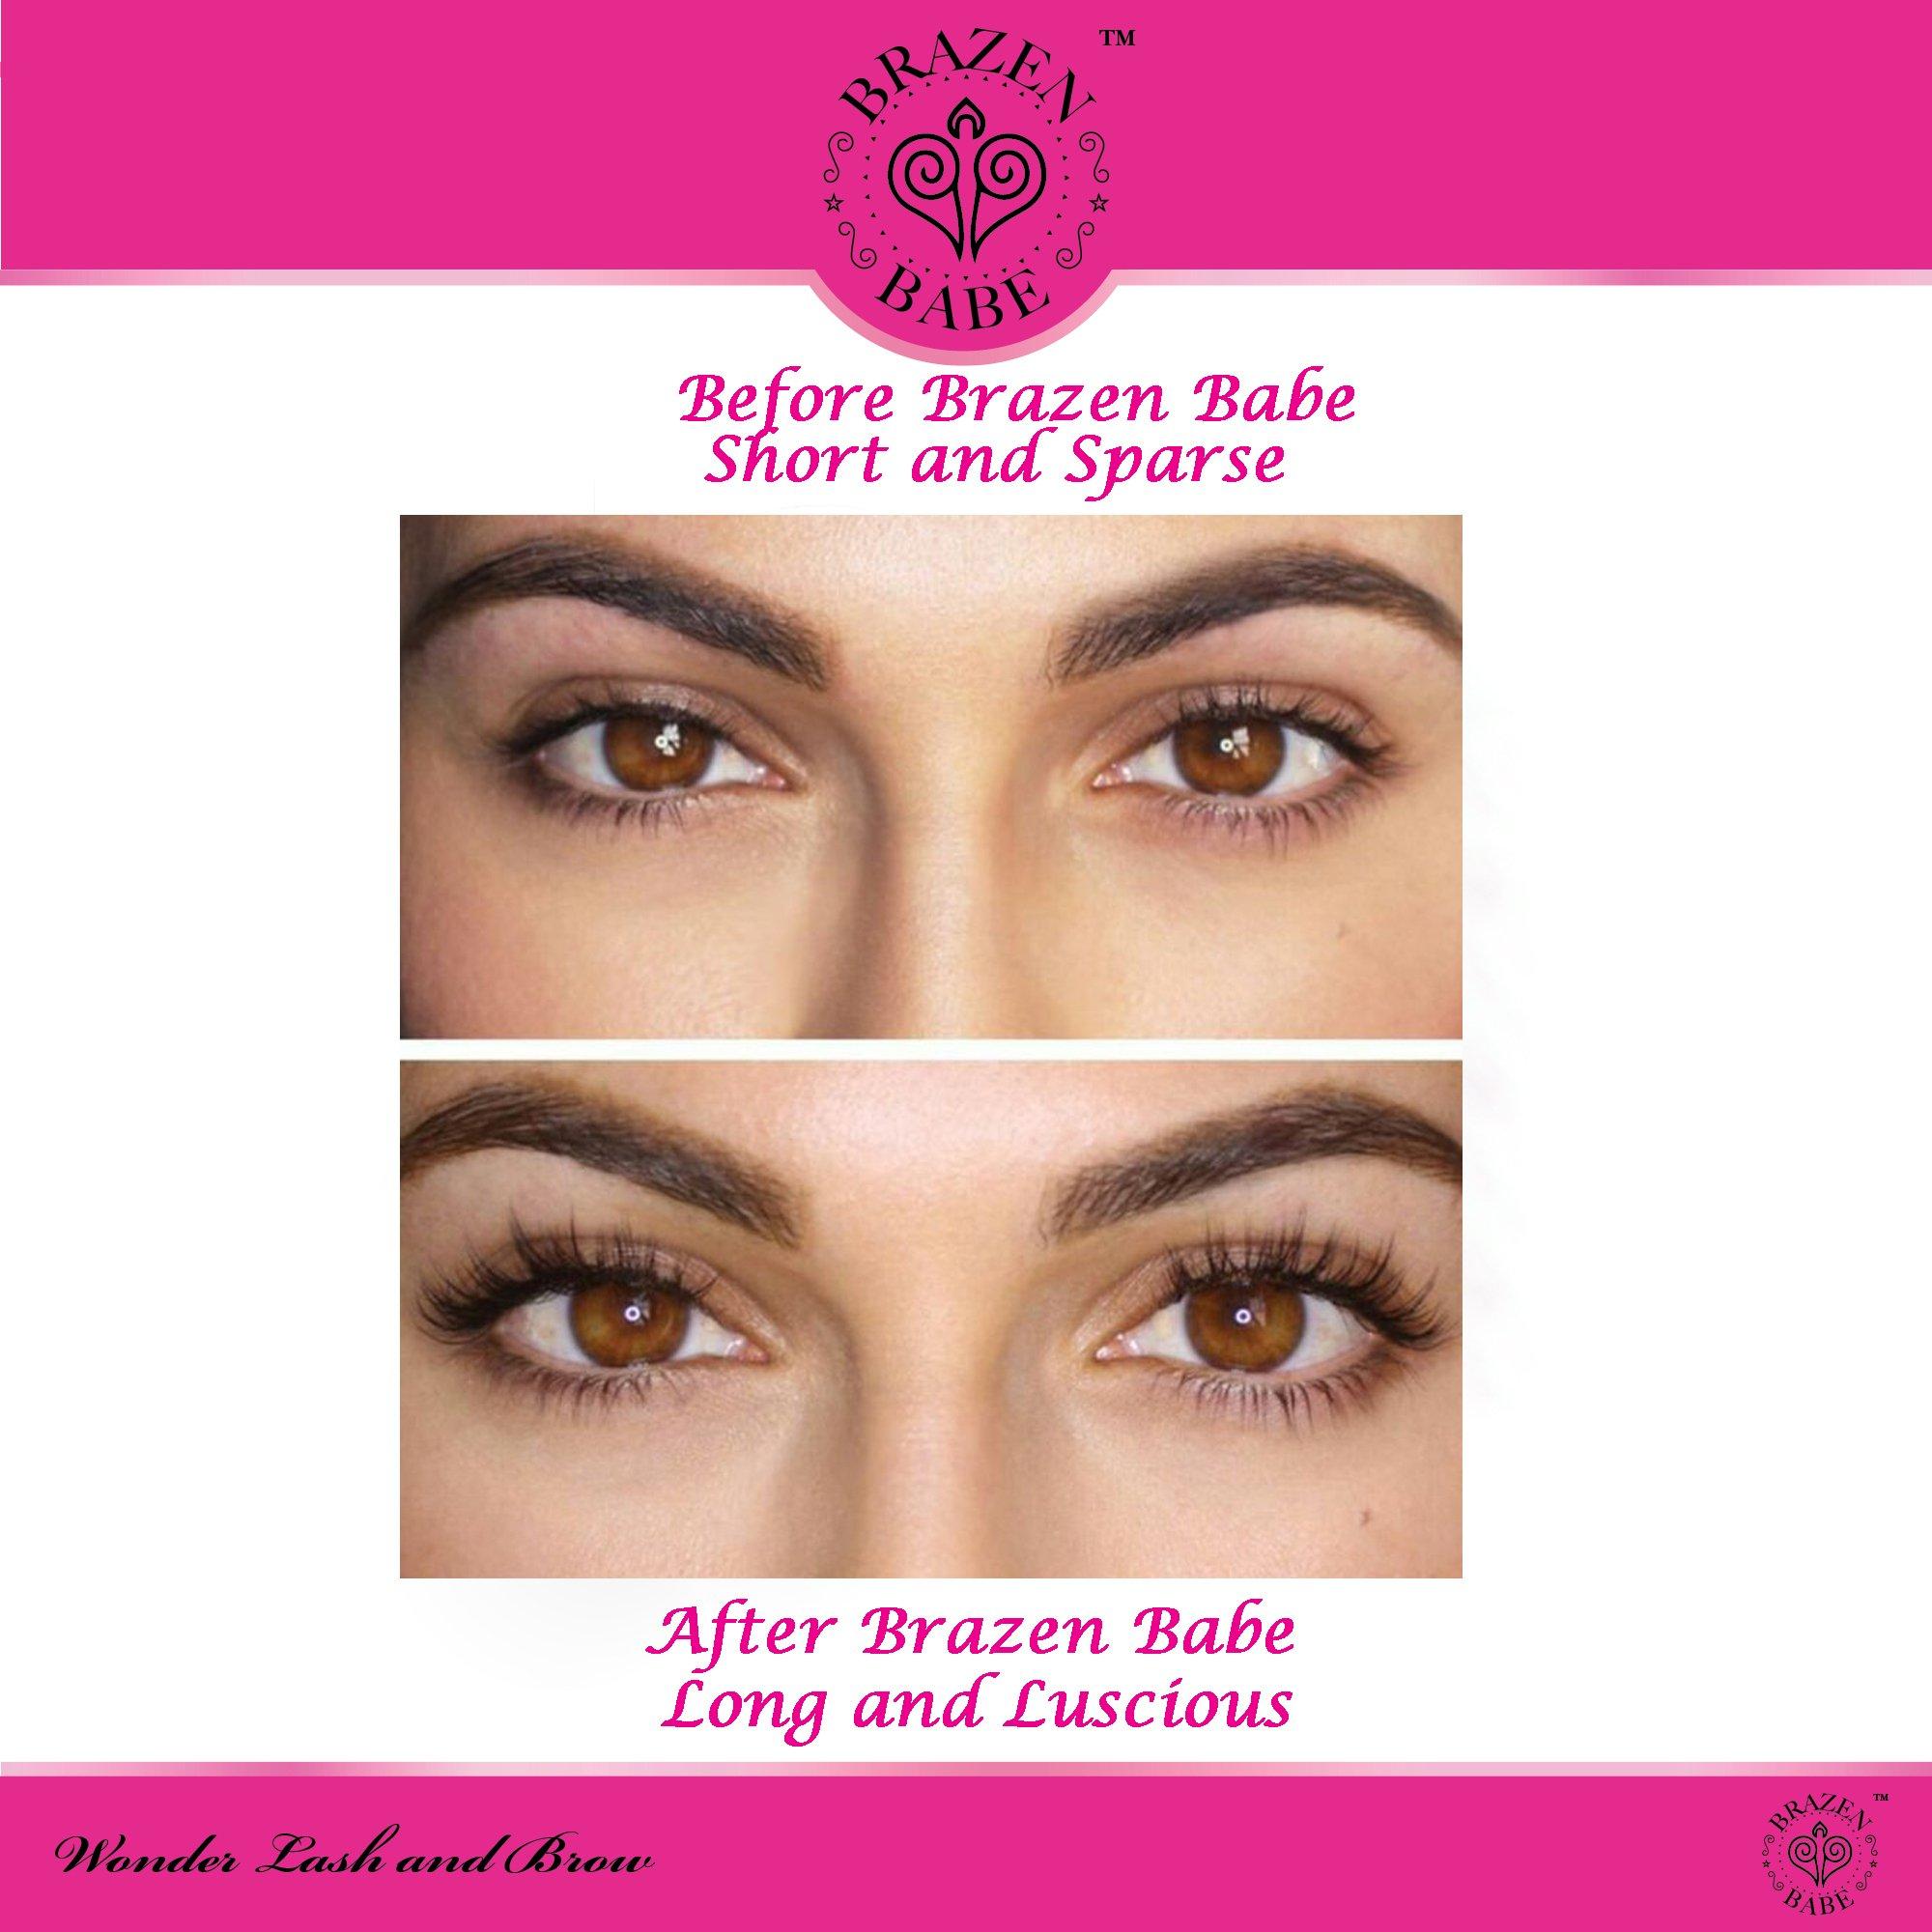 Eyelash Growth Serum Wonder Lash And Brow By Brazen Babe